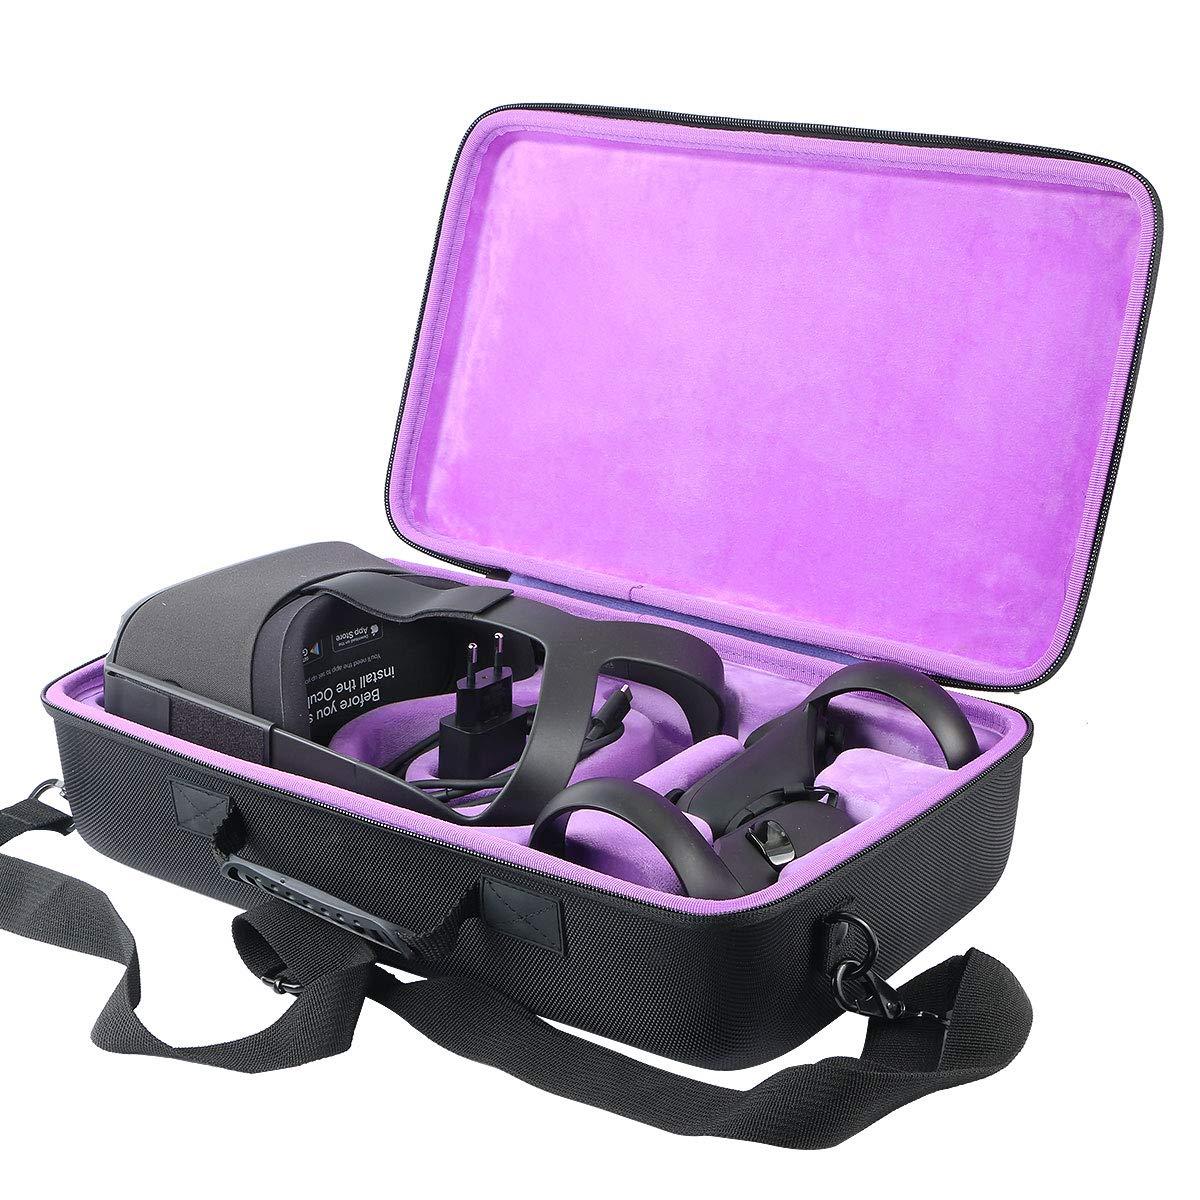 khanka Hard Travel Case for Oculus Quest 2/2020 Edition 3D VR Gaming Headset (Inside Purple)